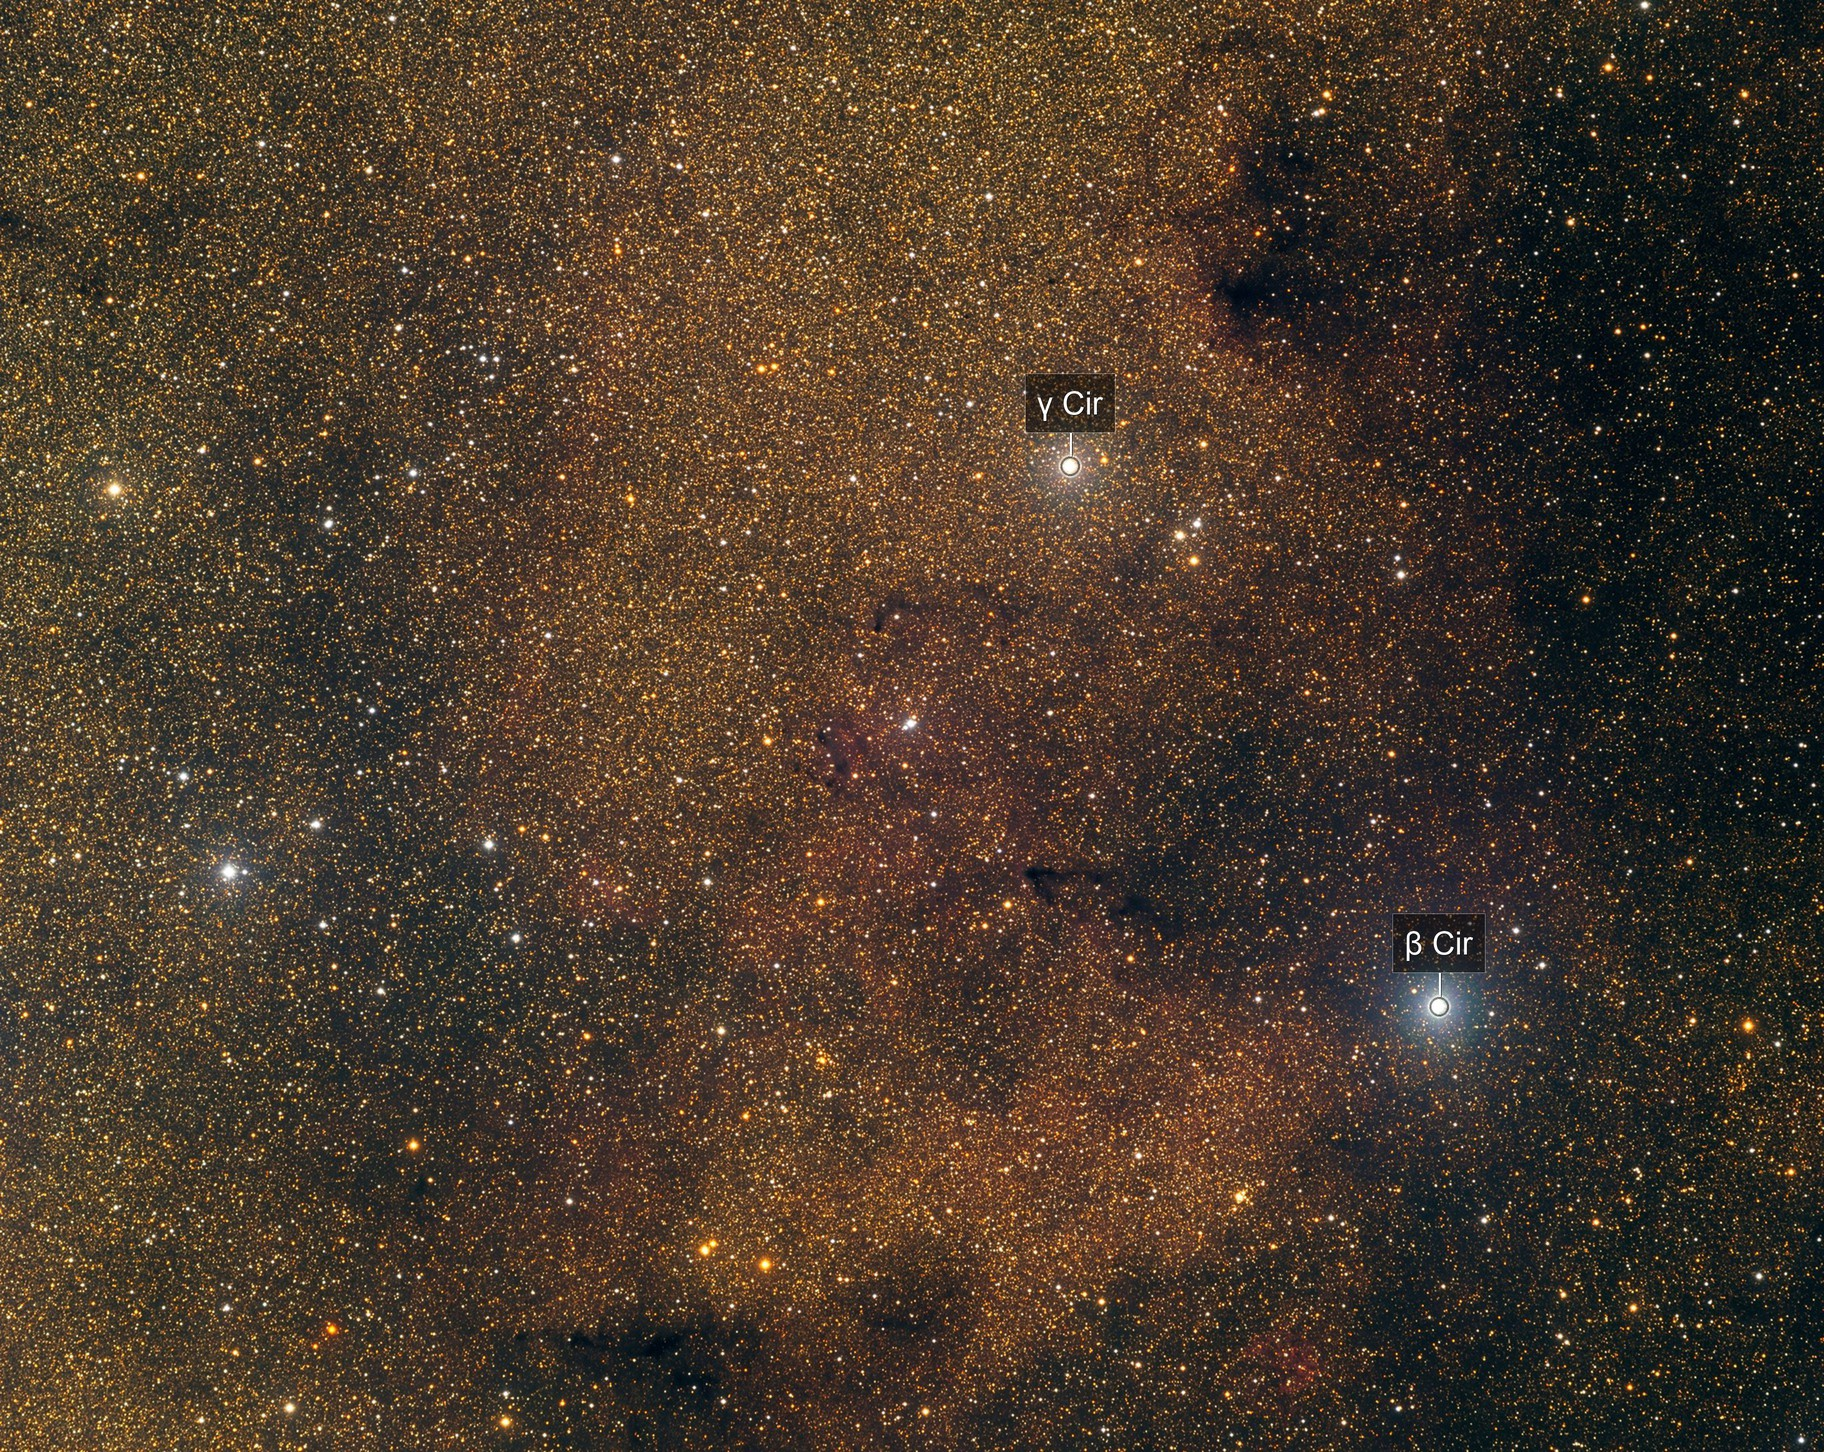 Nébuleuse constituée d'hydrogène ionisée (HII), constellation du Compas